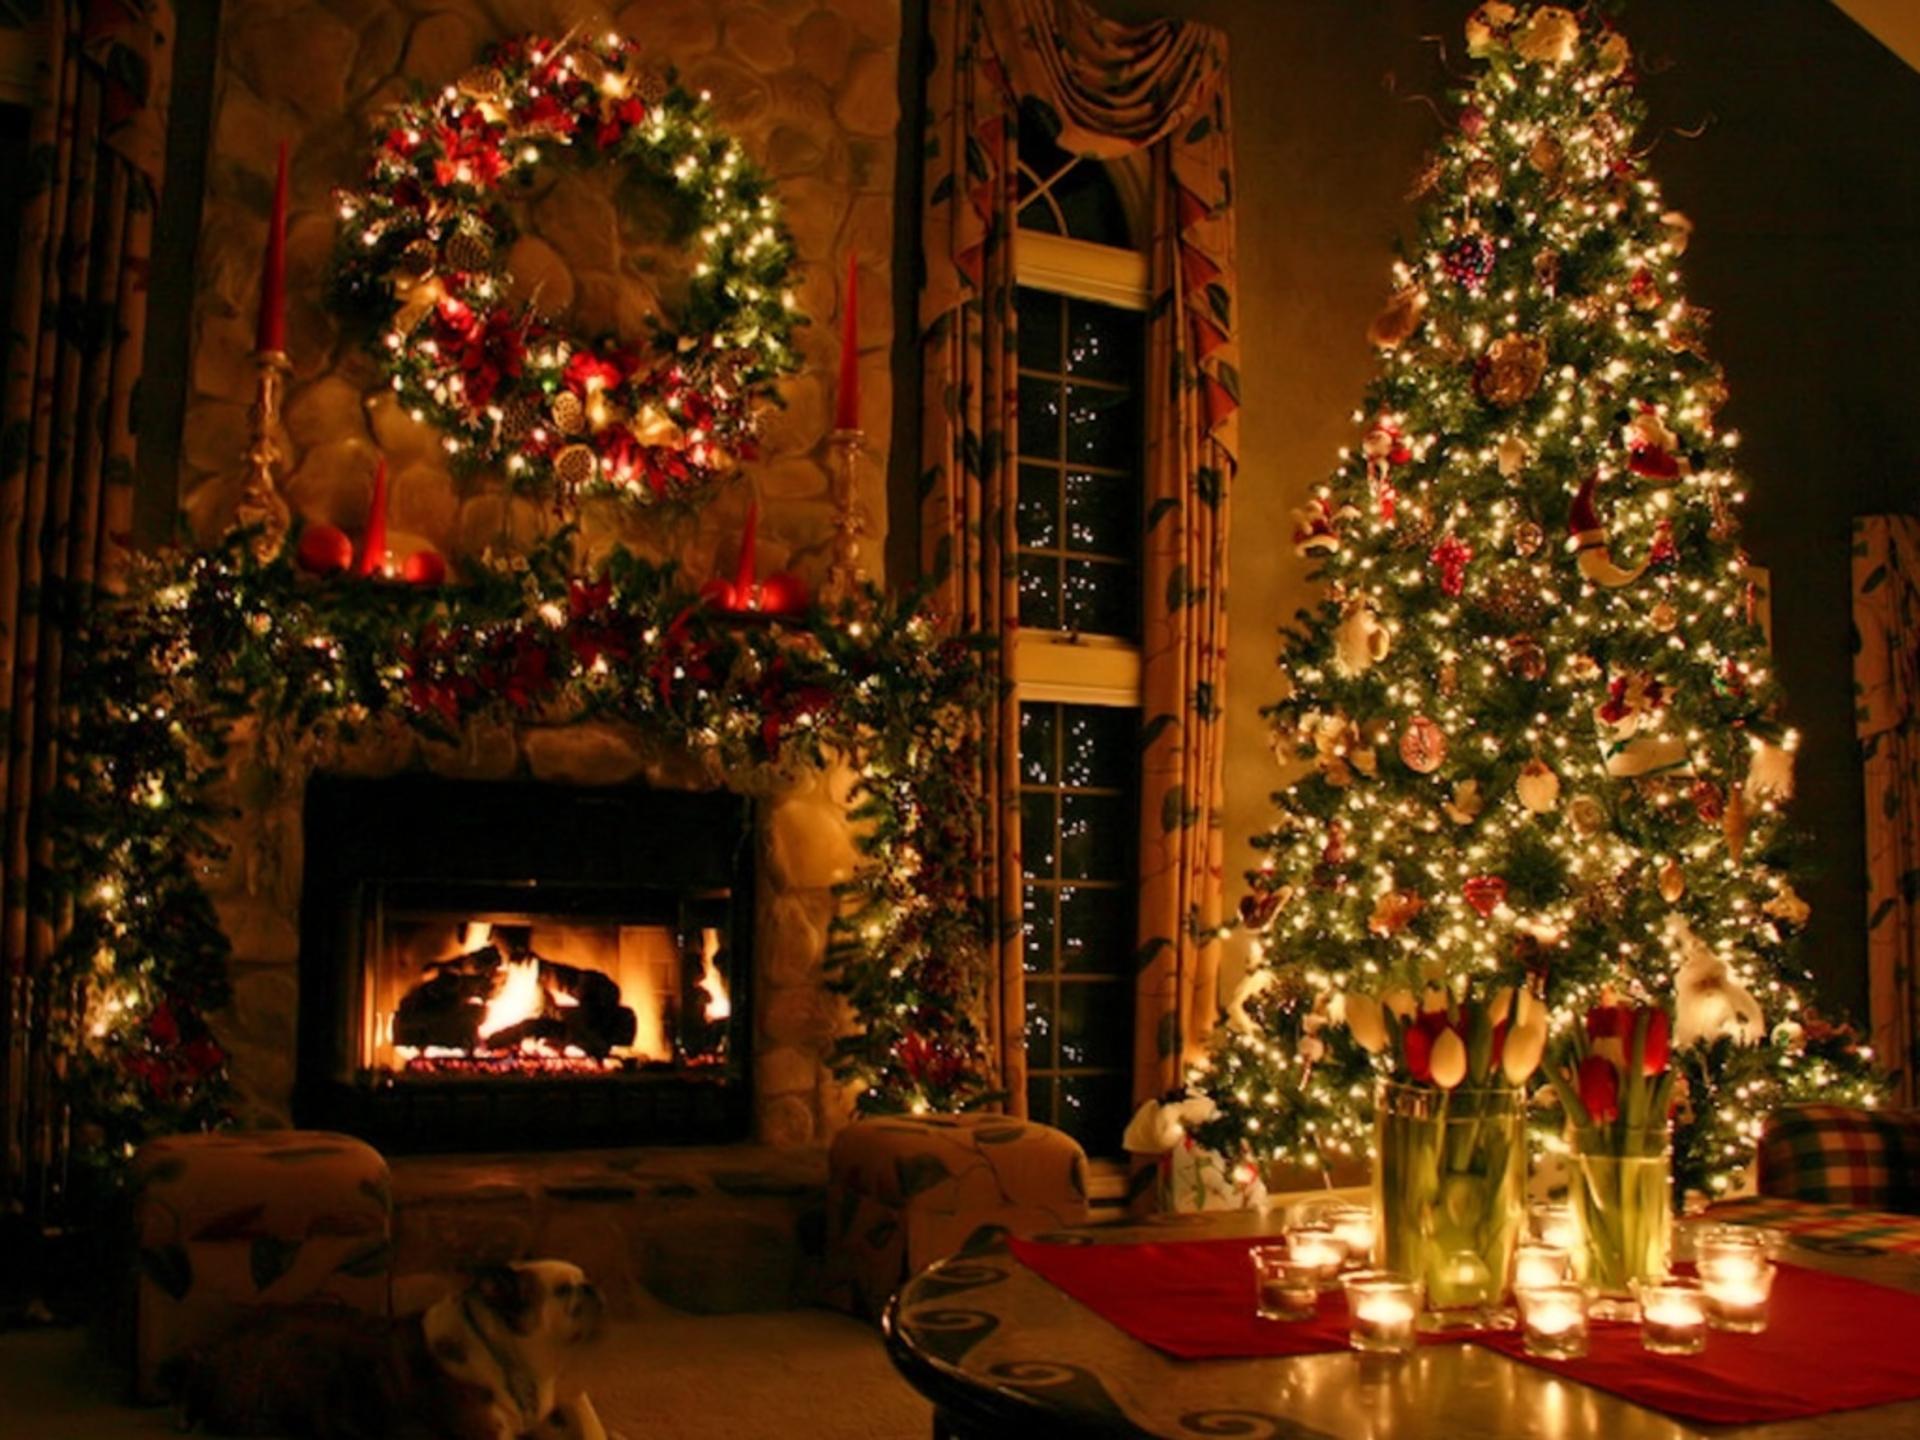 Christmas fireplace fire holiday festive decorations hx 1920x1440